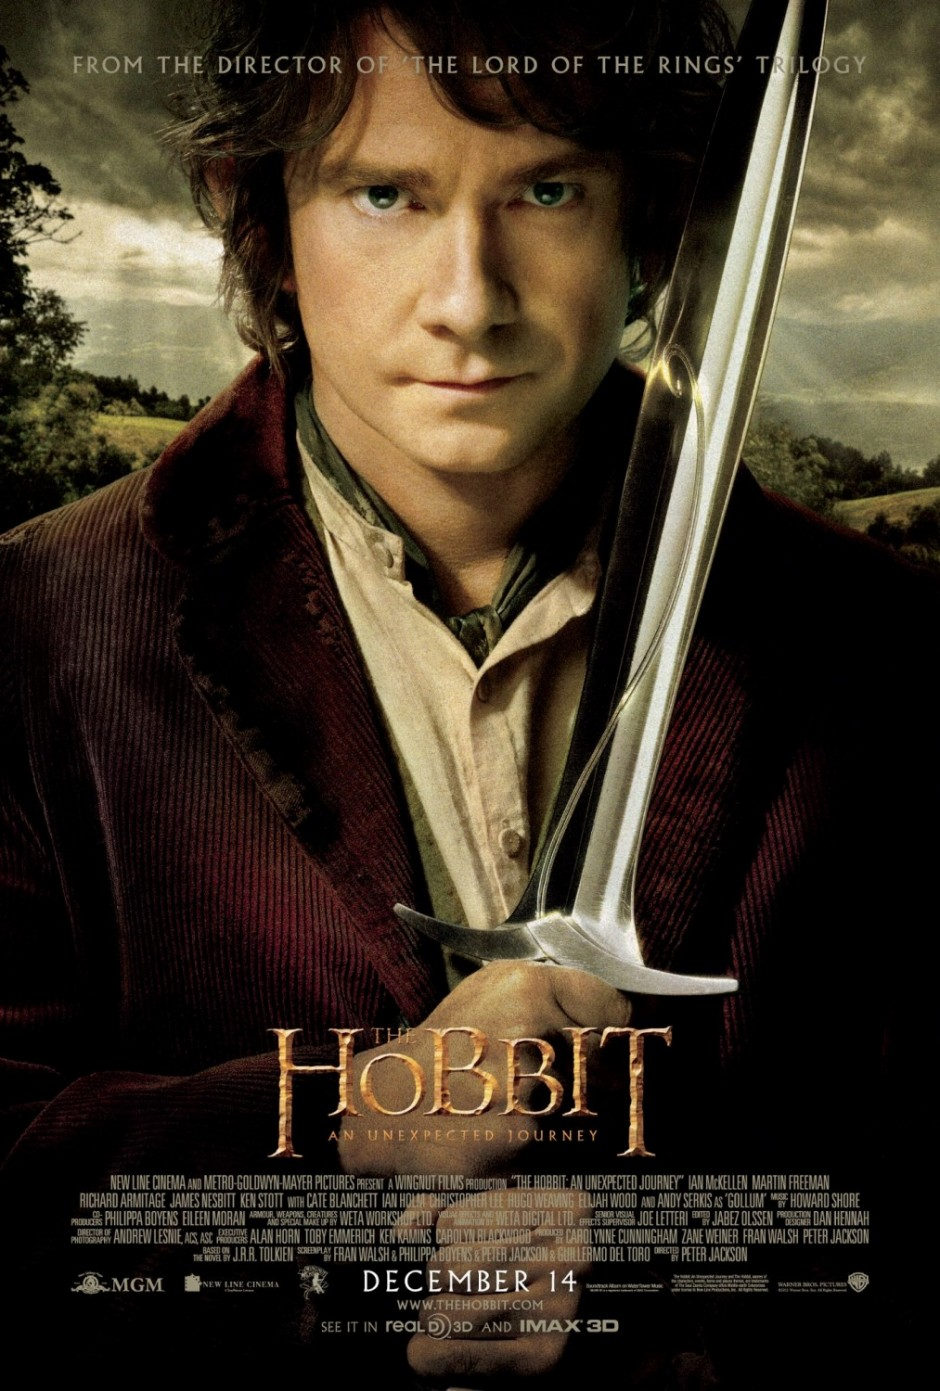 The Hobbit by J.R.R. Tolkien with Bilbo Baggins